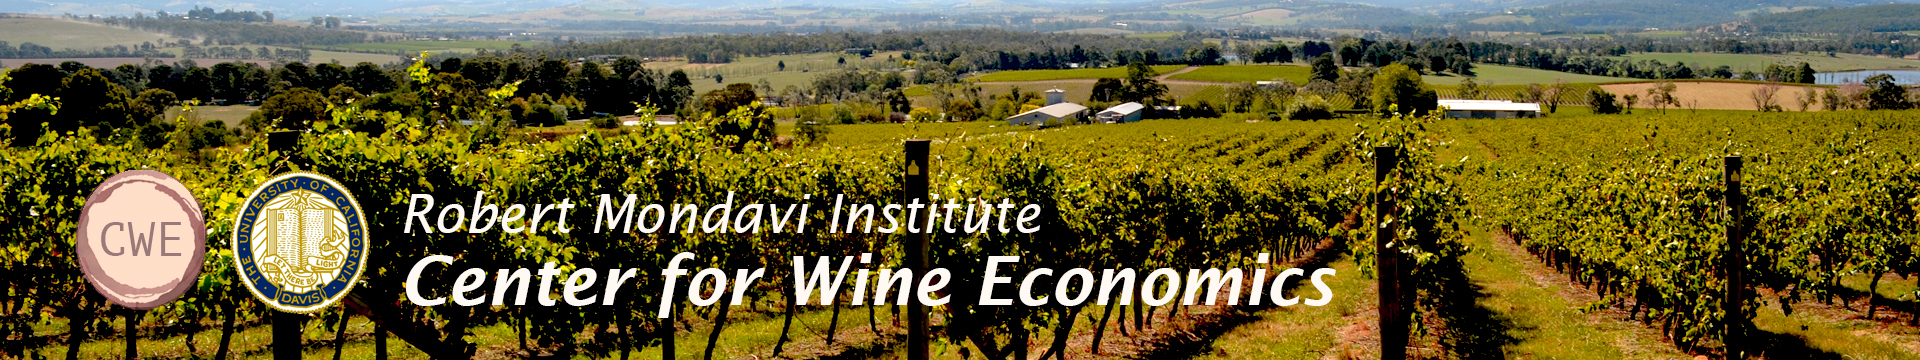 Center for Wine Economics